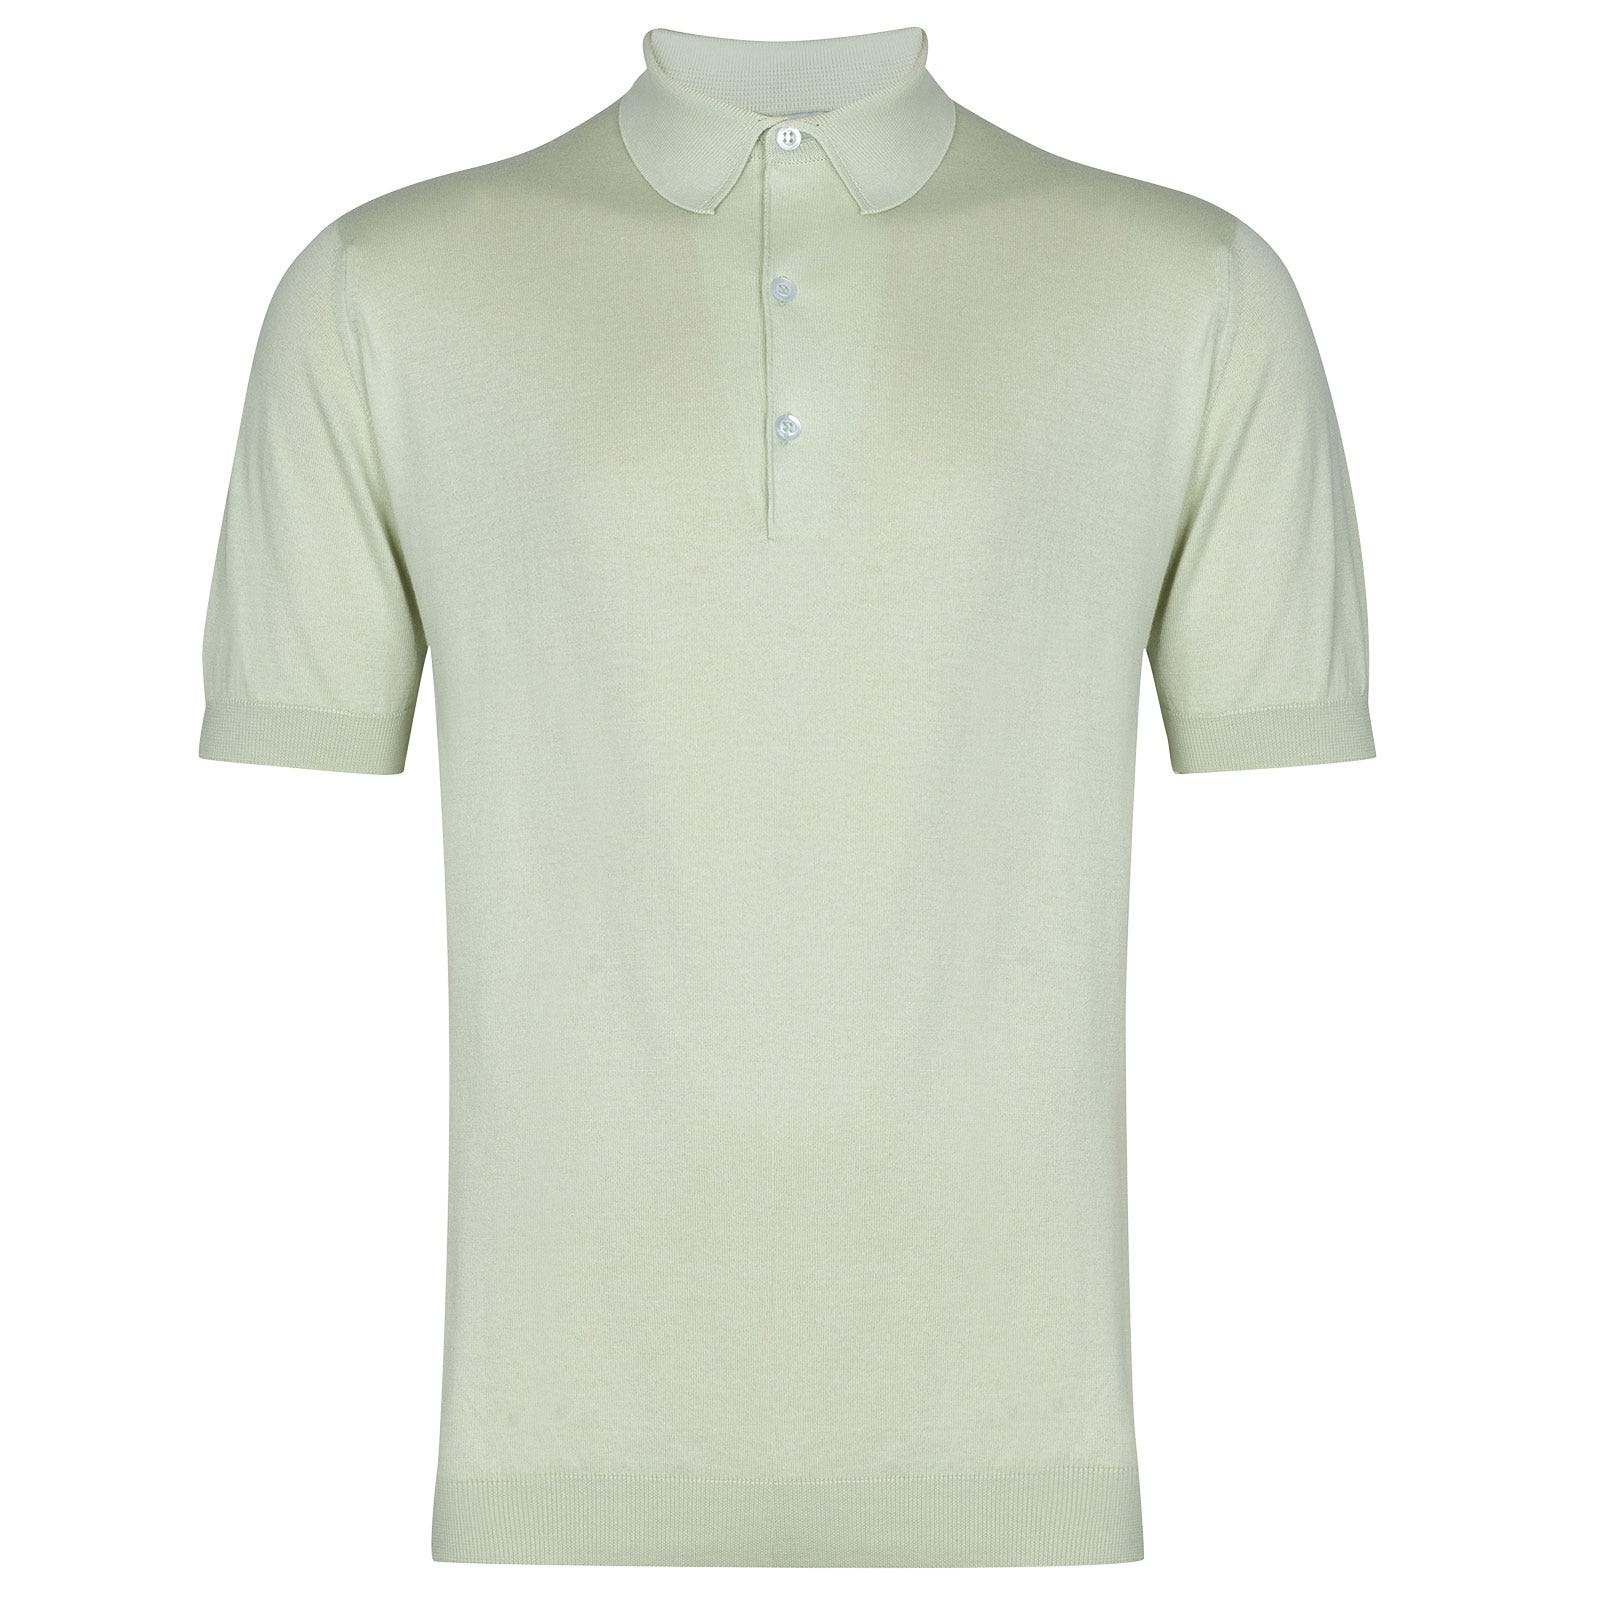 John Smedley Adrian in Bud Green Shirt-XLG